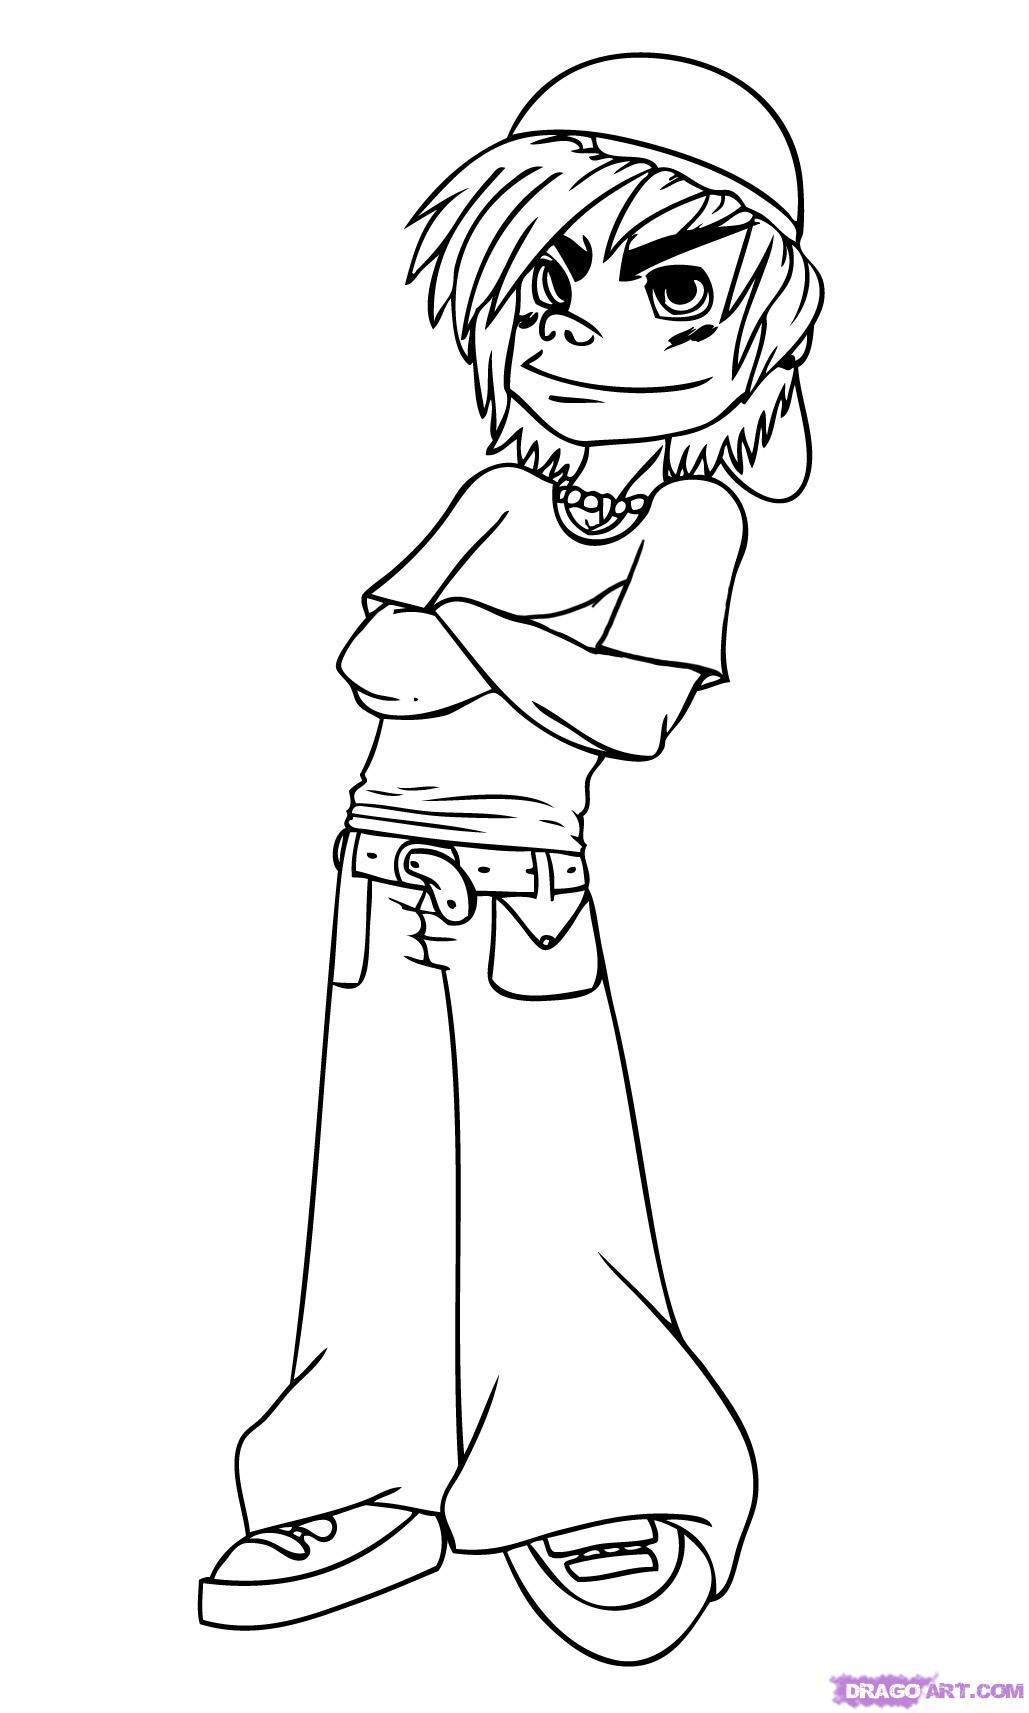 1029x1713 Cartoon Boy Drawing 8. How To Draw A Cartoon Kid